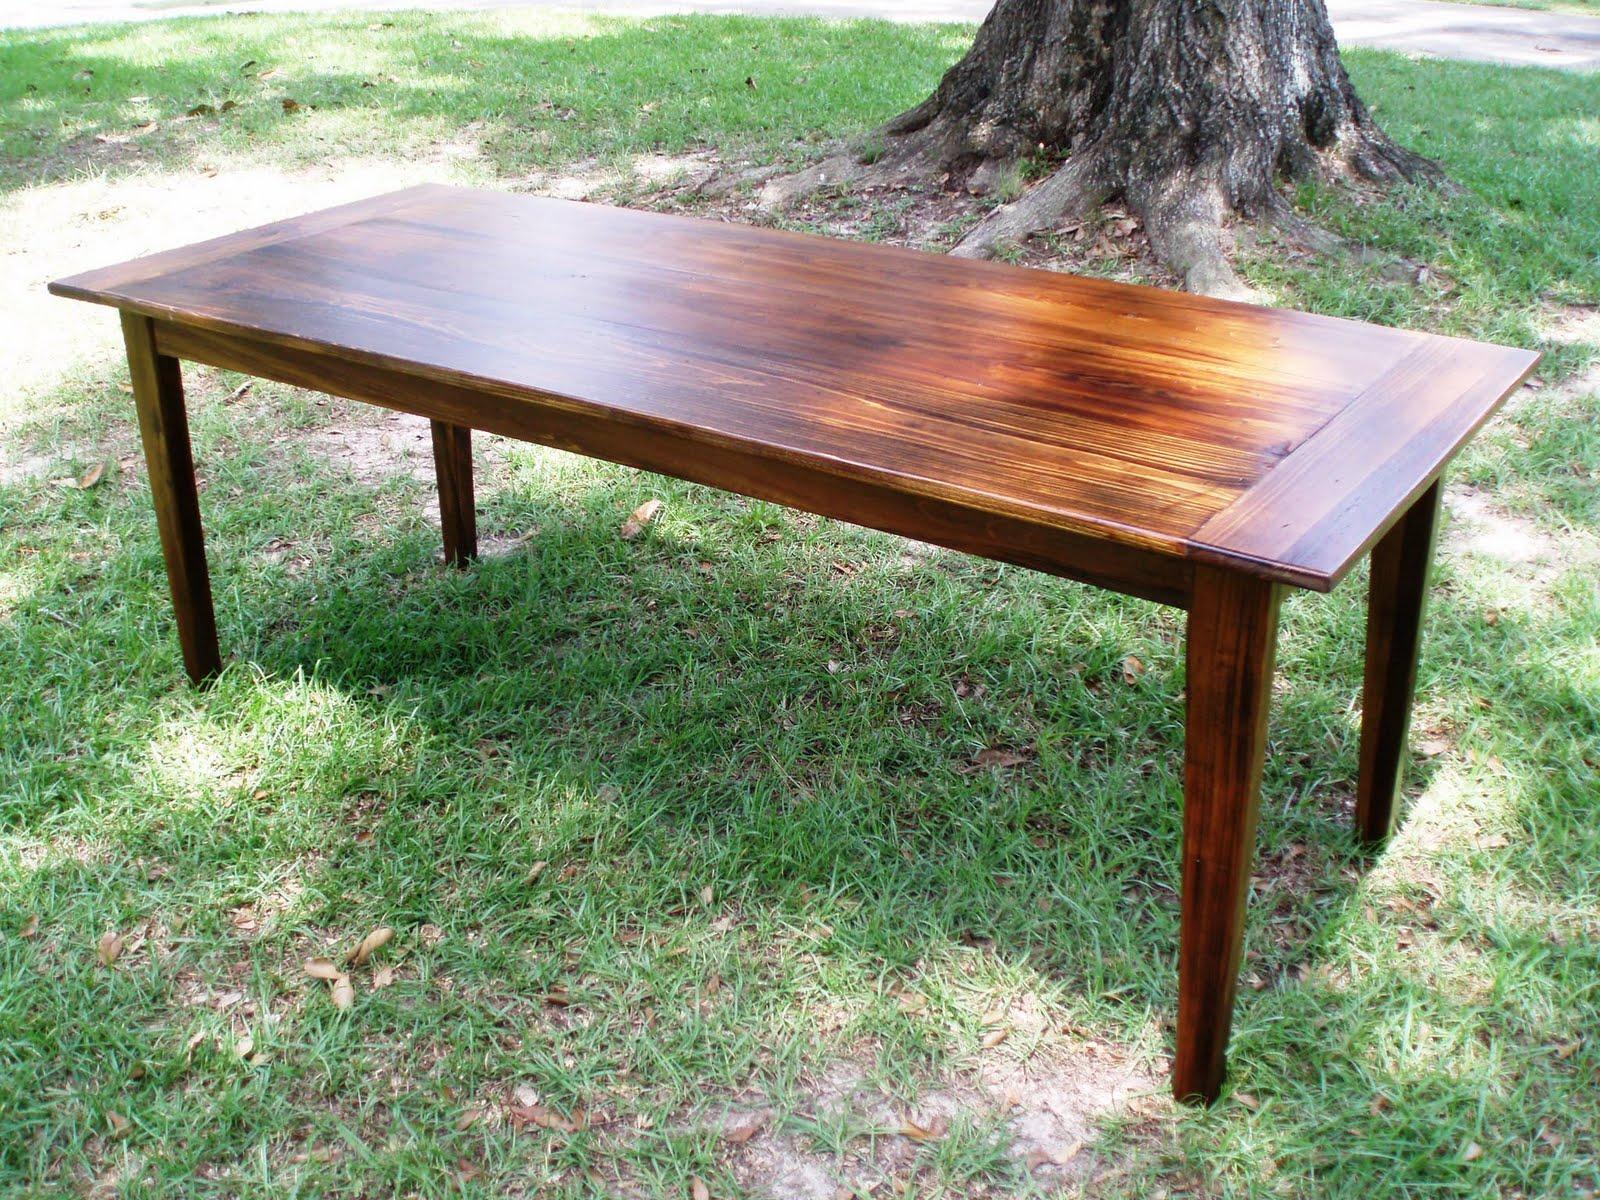 "Three Coins 96"" Cypress Patio Table - 1009 |Artsy Tables Cypress"